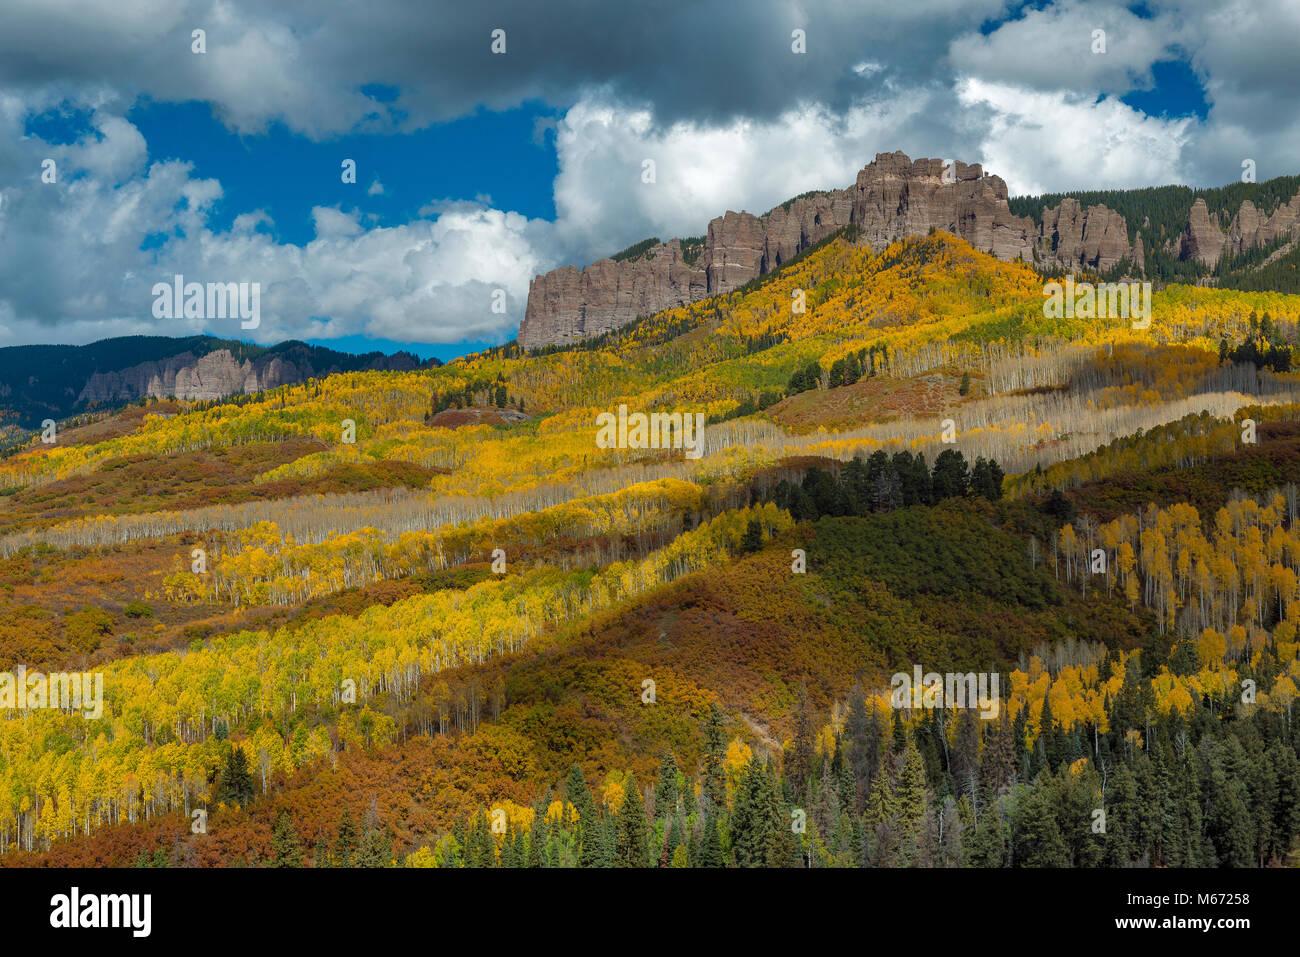 Espen, Populus tremula, Cimarron Ridge, Uncompahgre National Forest, Colorado Stockbild